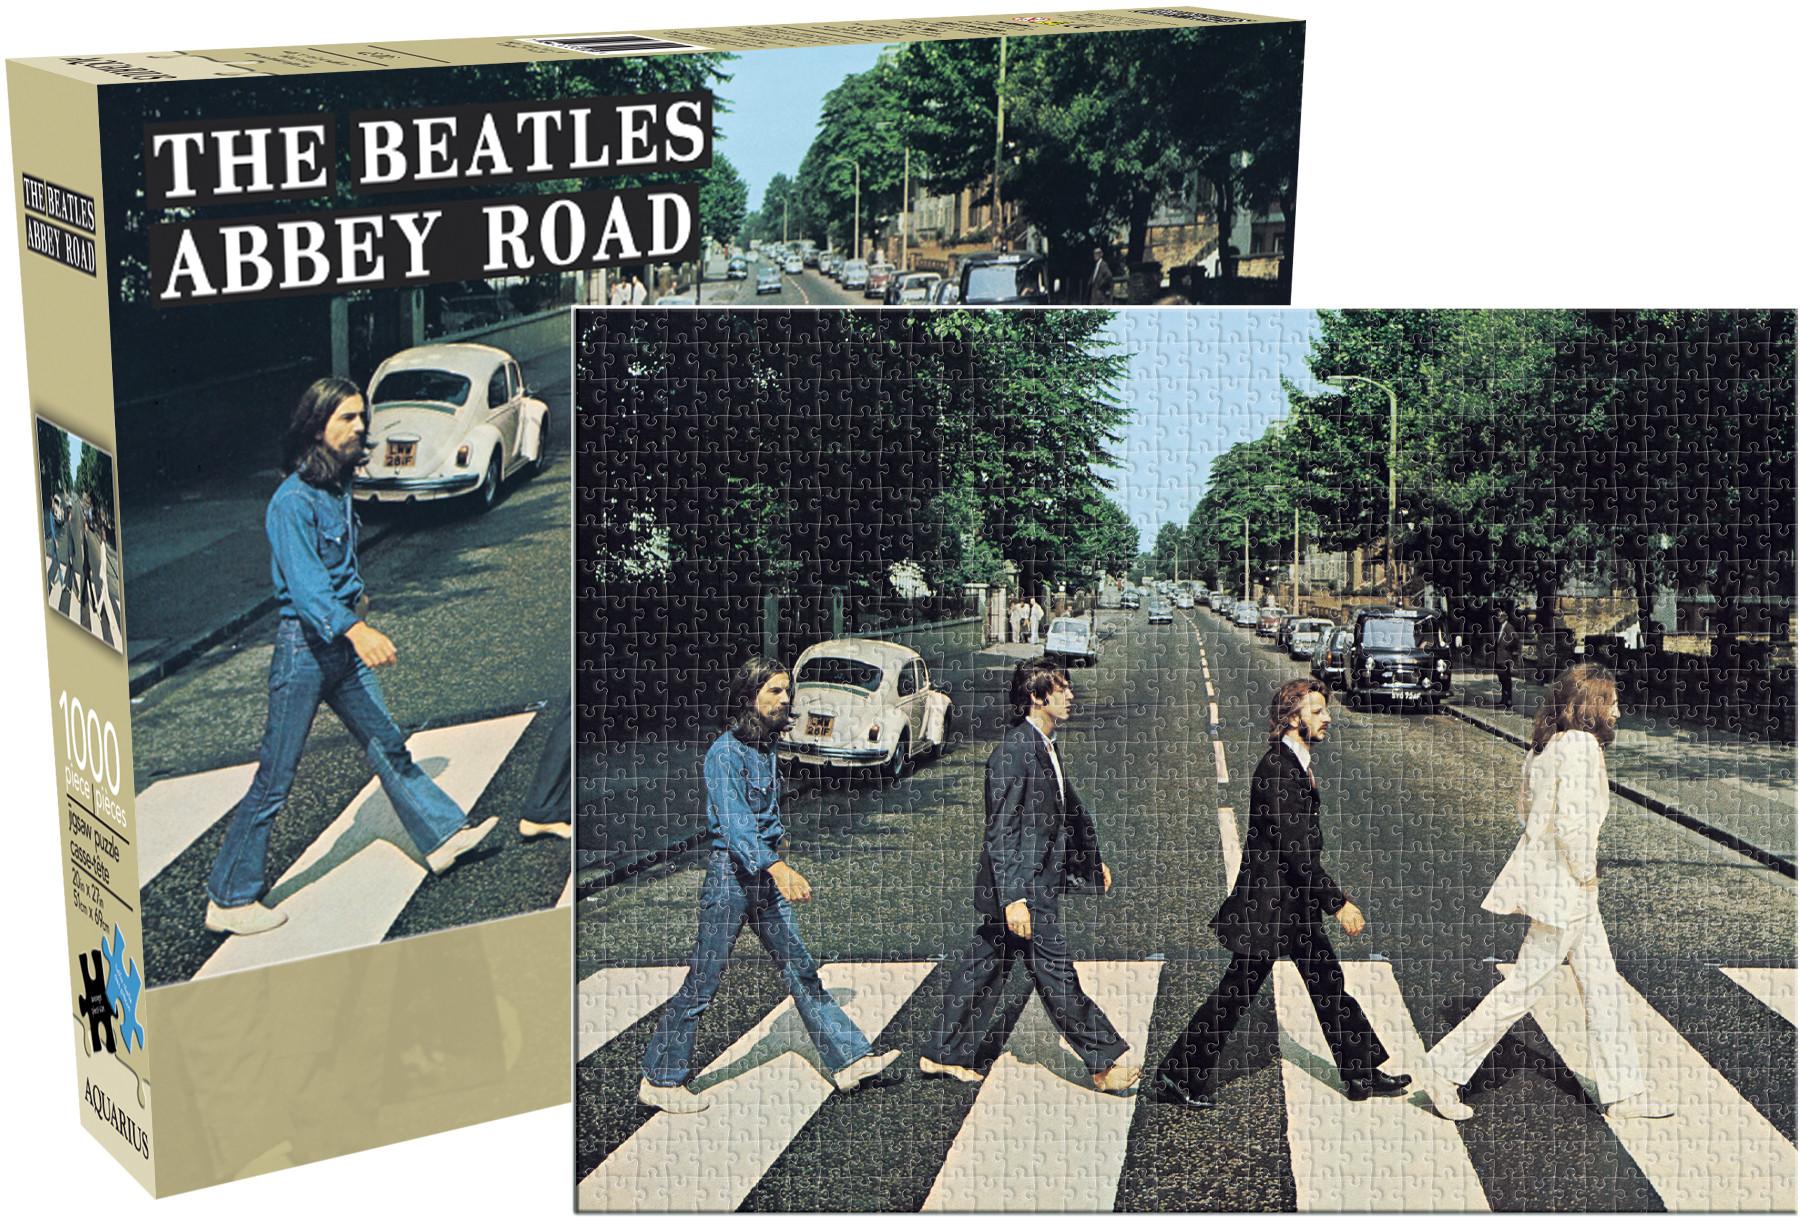 Beatles' Abbey Road album